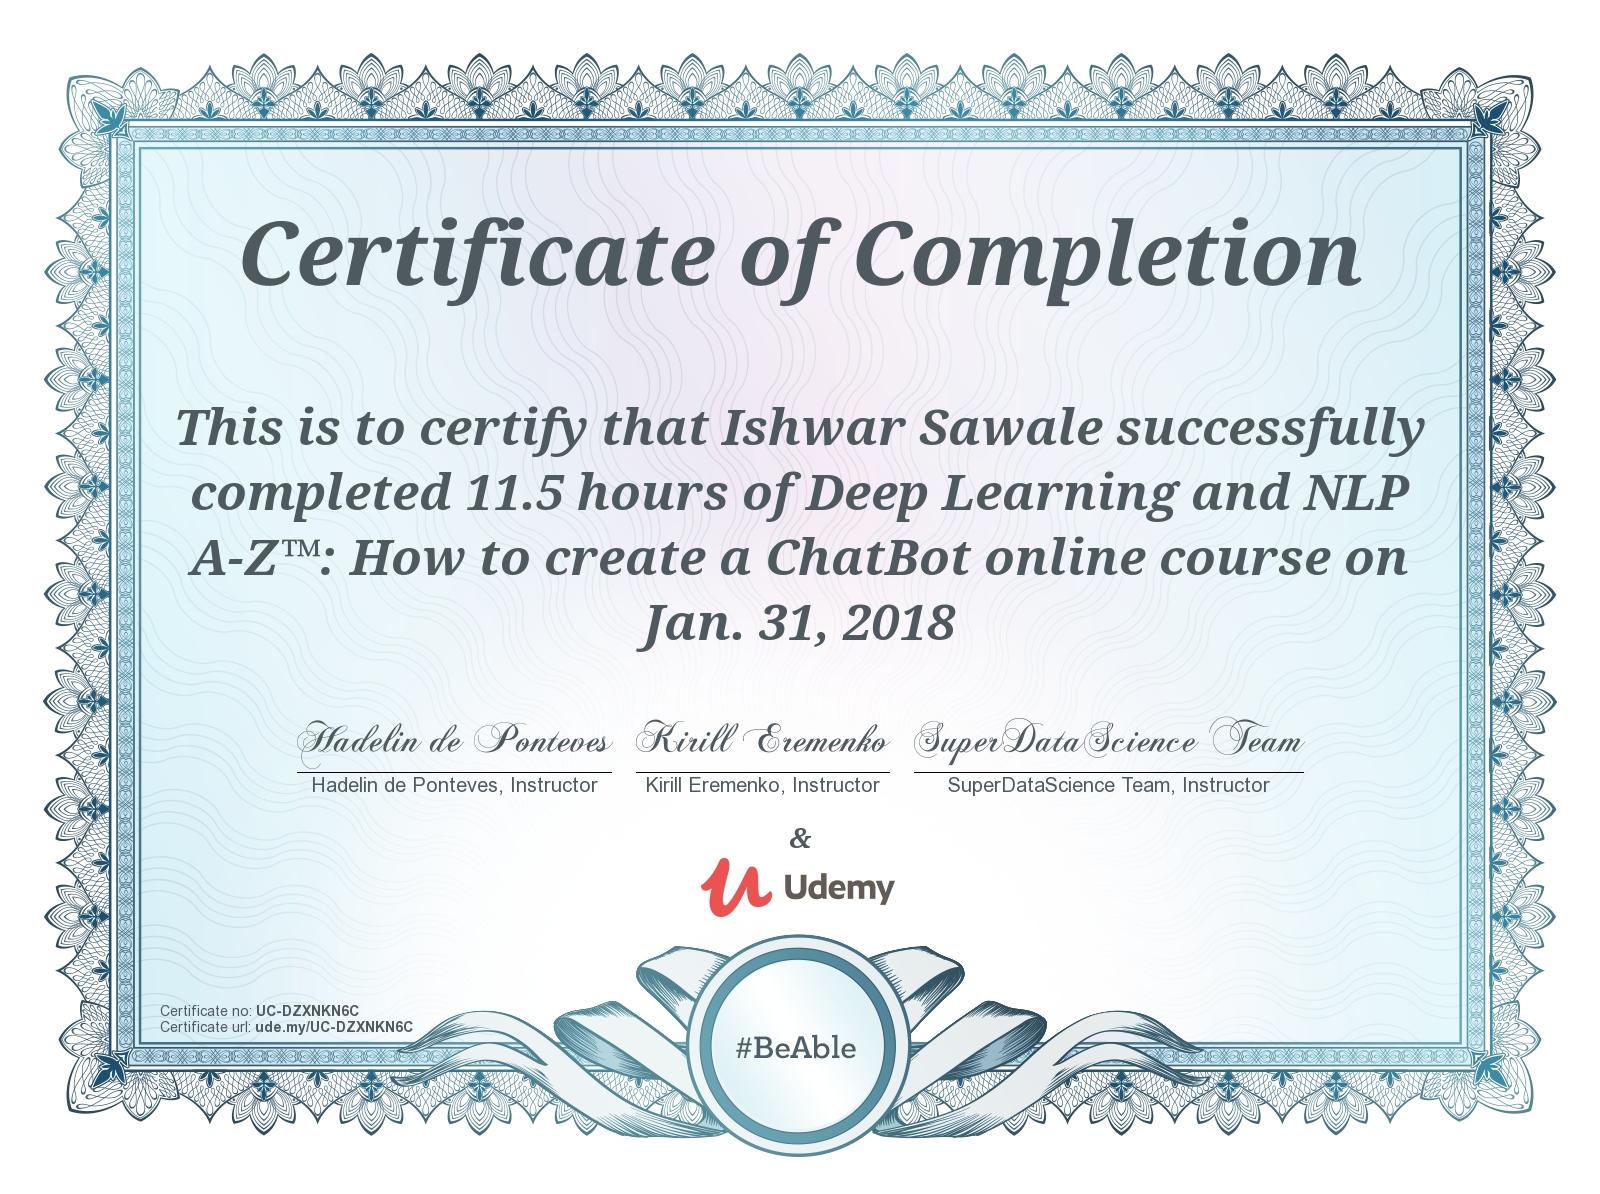 Ishwar Sawale